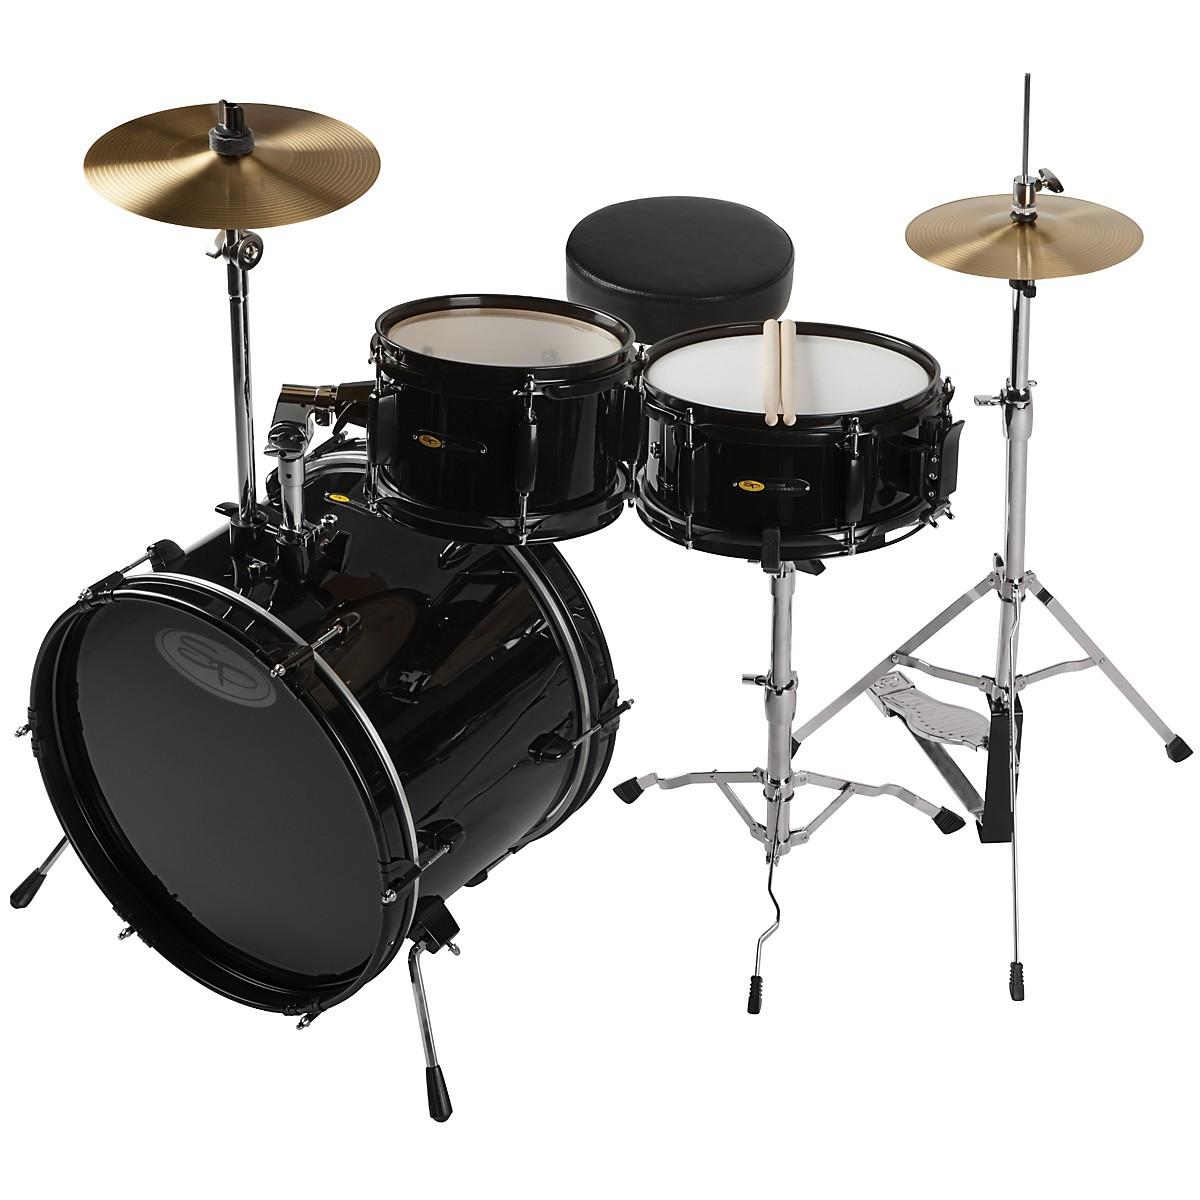 Sound Percussion Labs Deluxe Jr. 3-Piece Drum Set